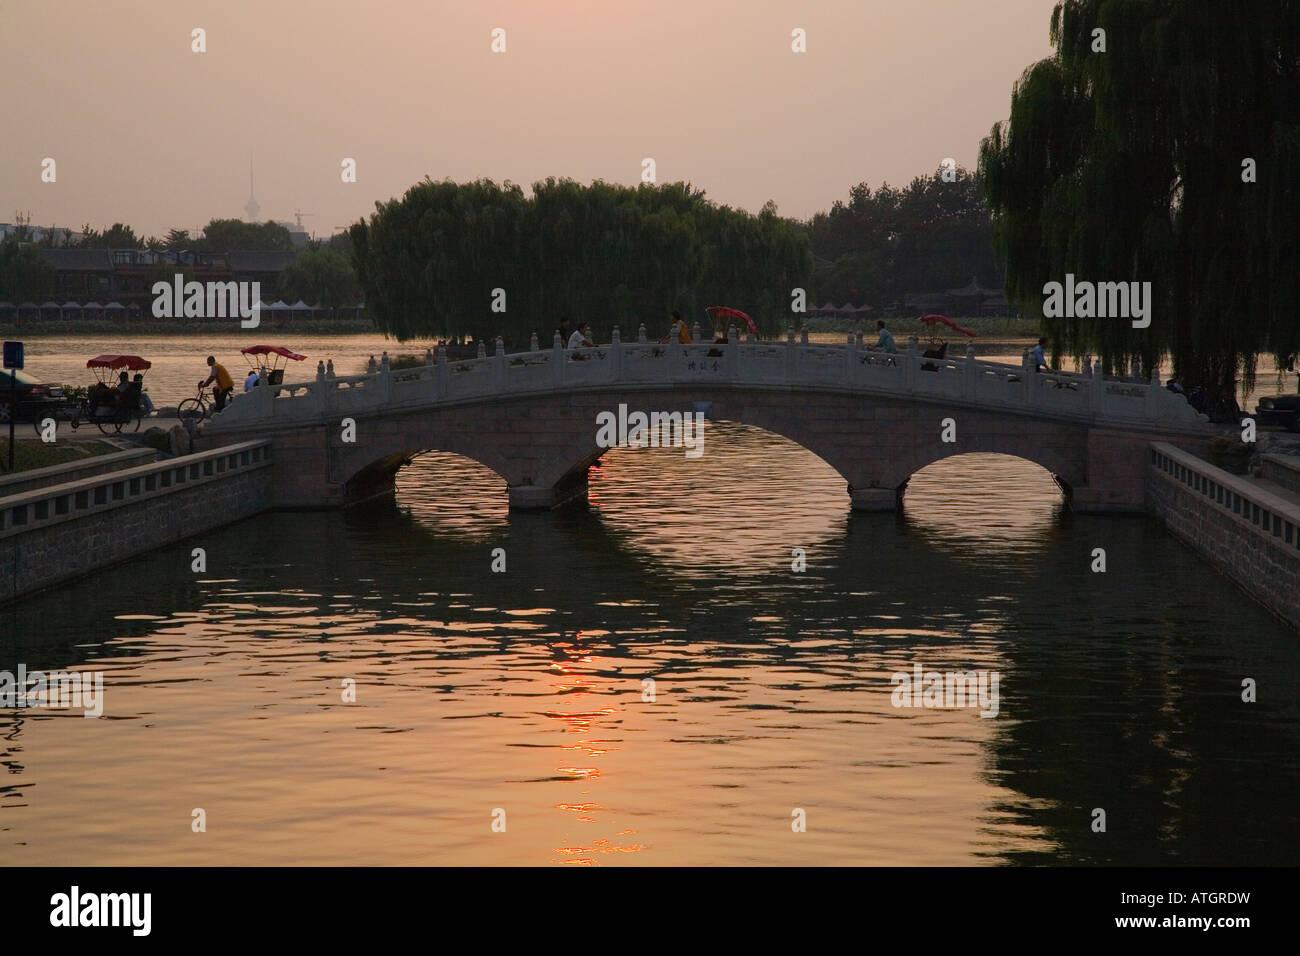 Back Lake of Shichahai, Beijing, China - Stock Image